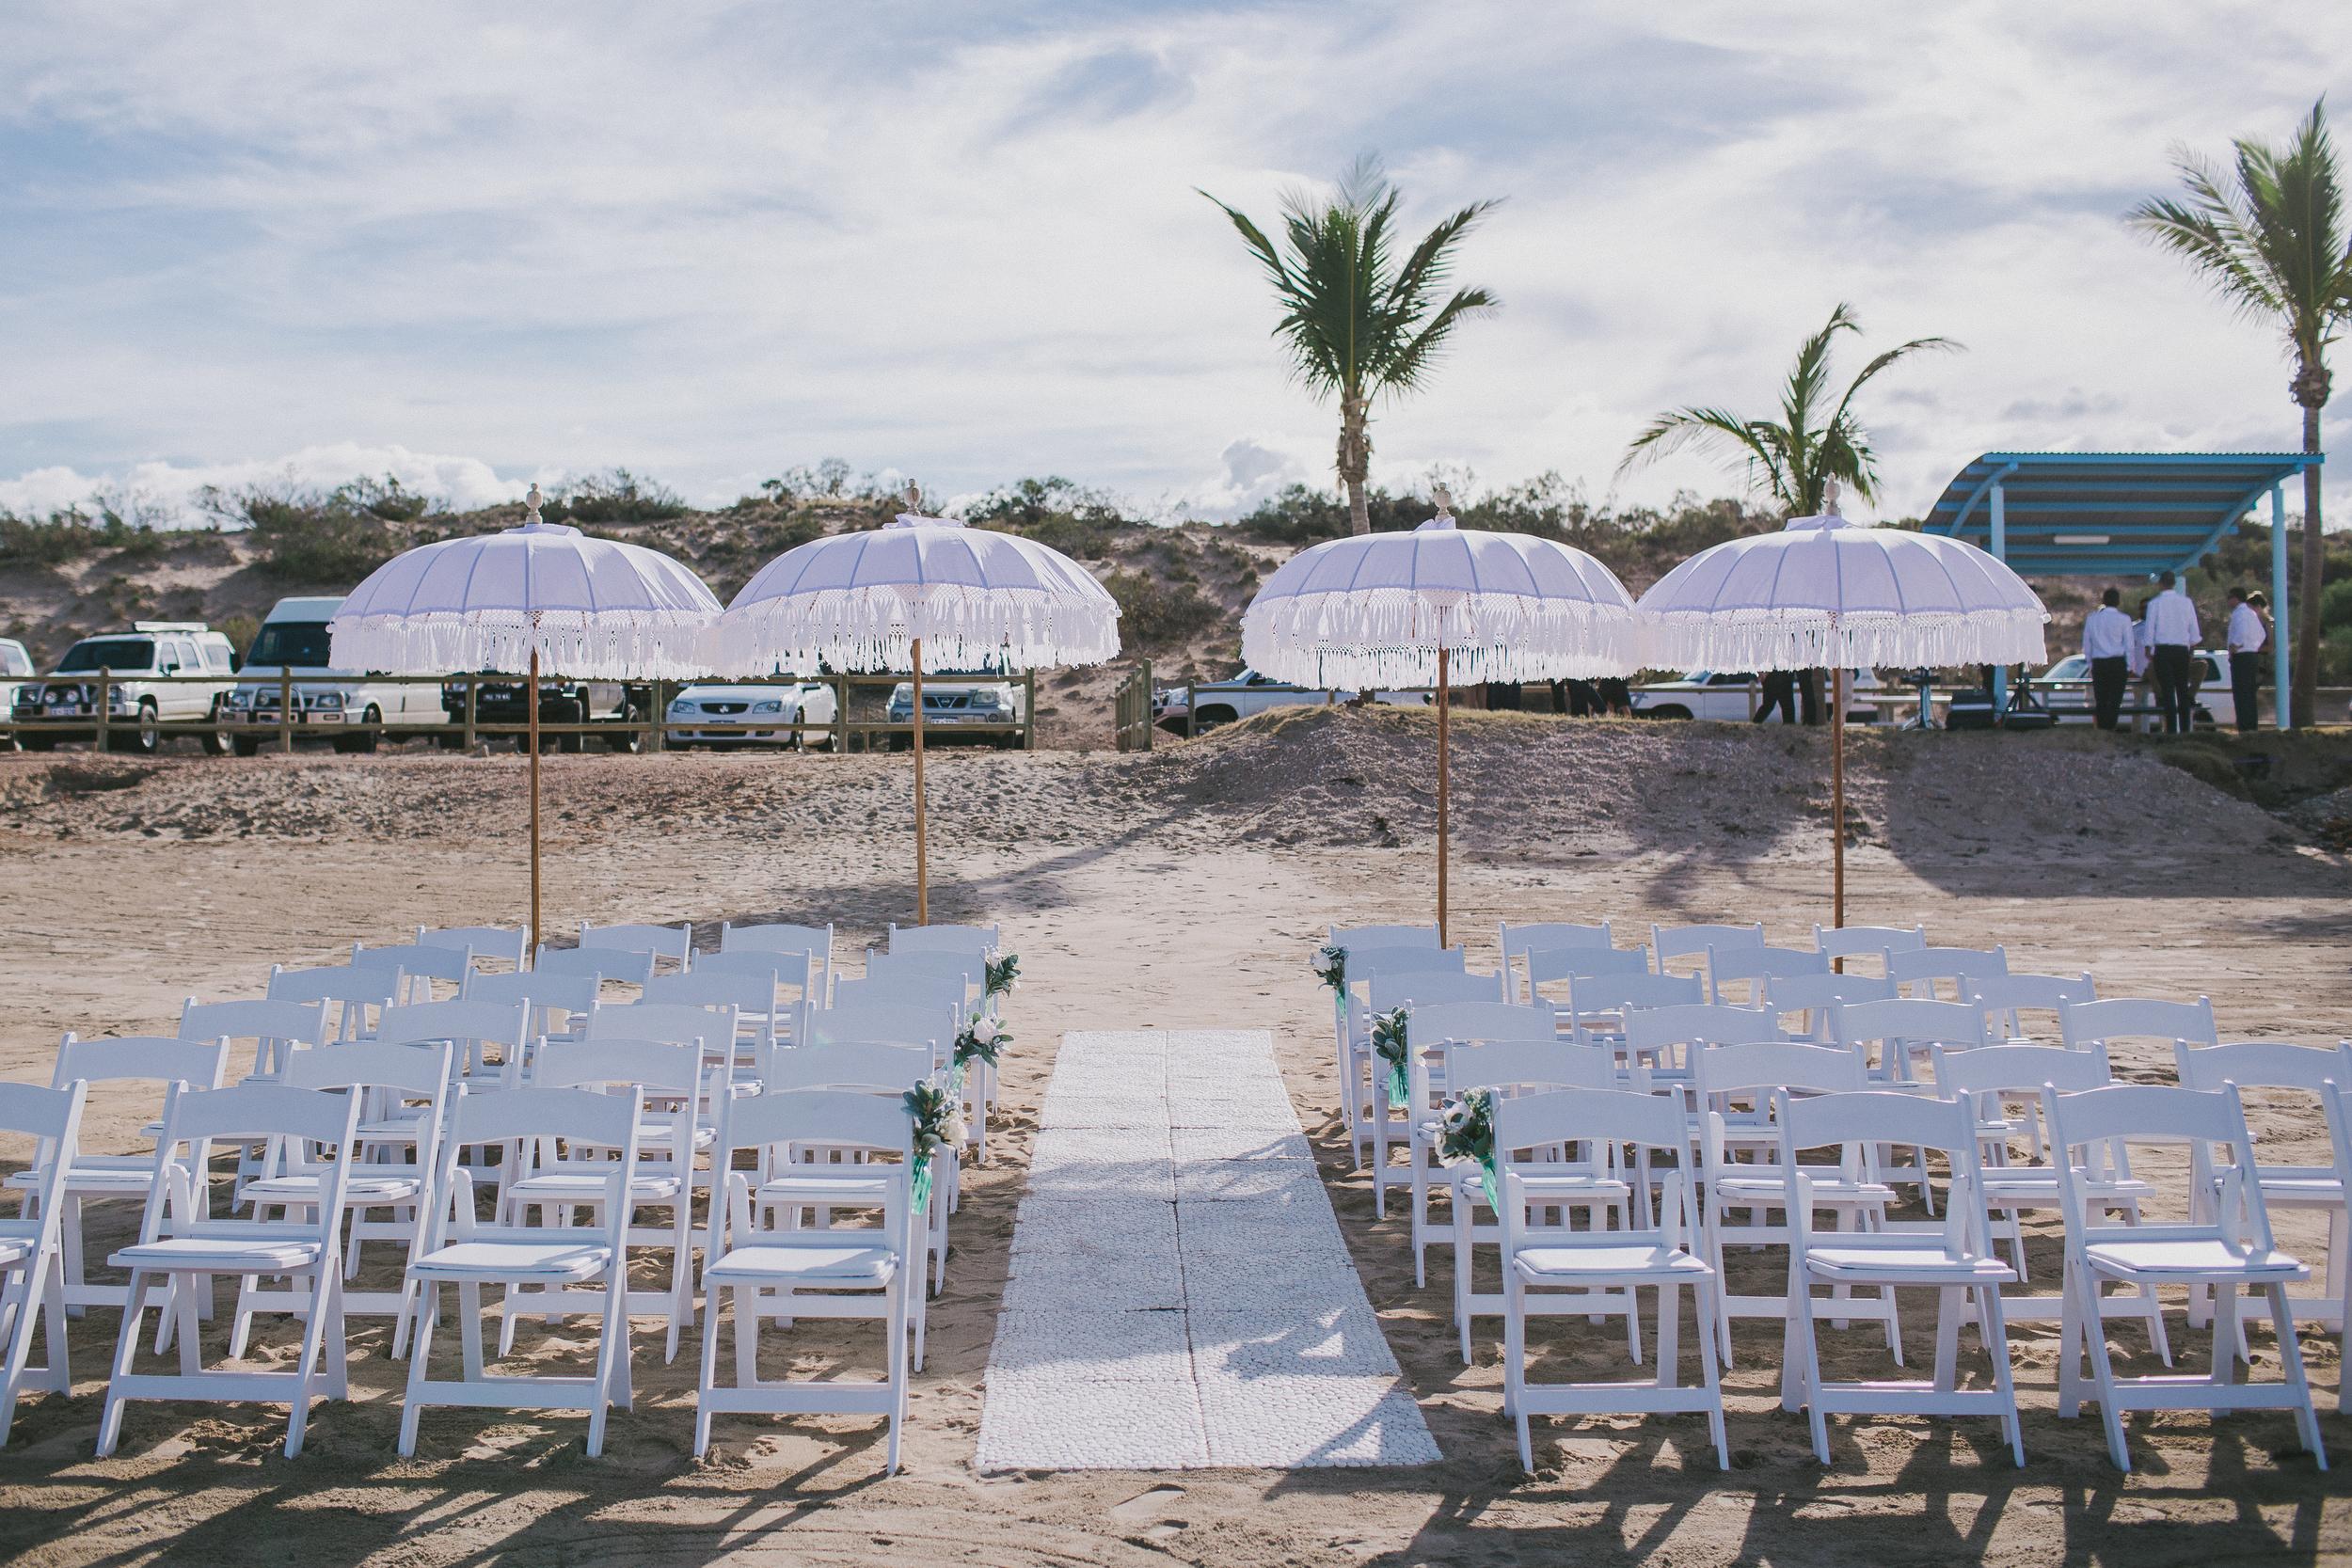 Pebble Matting Aisle, Gladiator Chairs & Bohemian Umbrellas